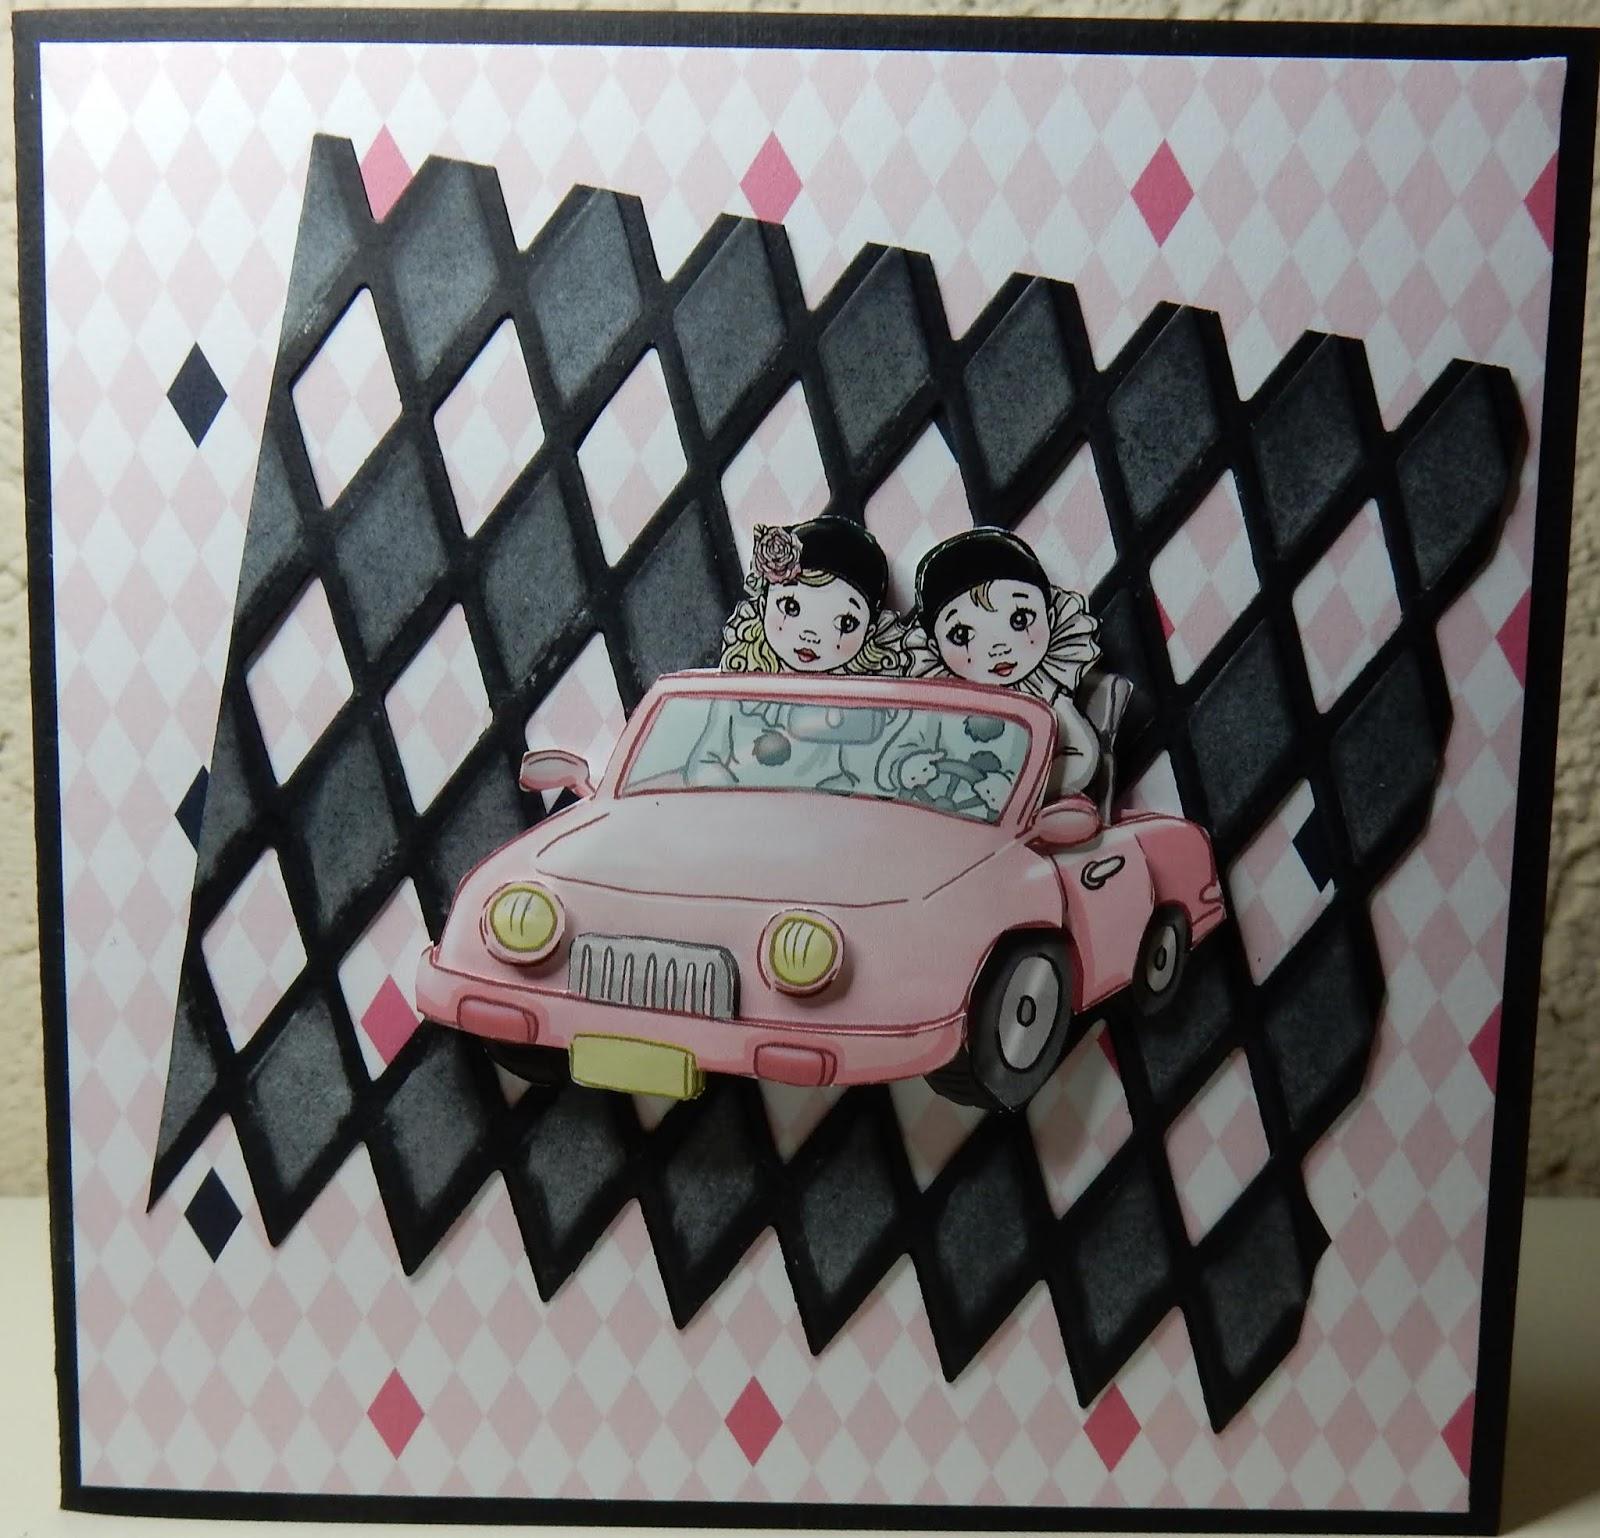 Extreem Hetty's Knutselhokkie!: Pretty Pierrot 2 Yvonne creations #YU94